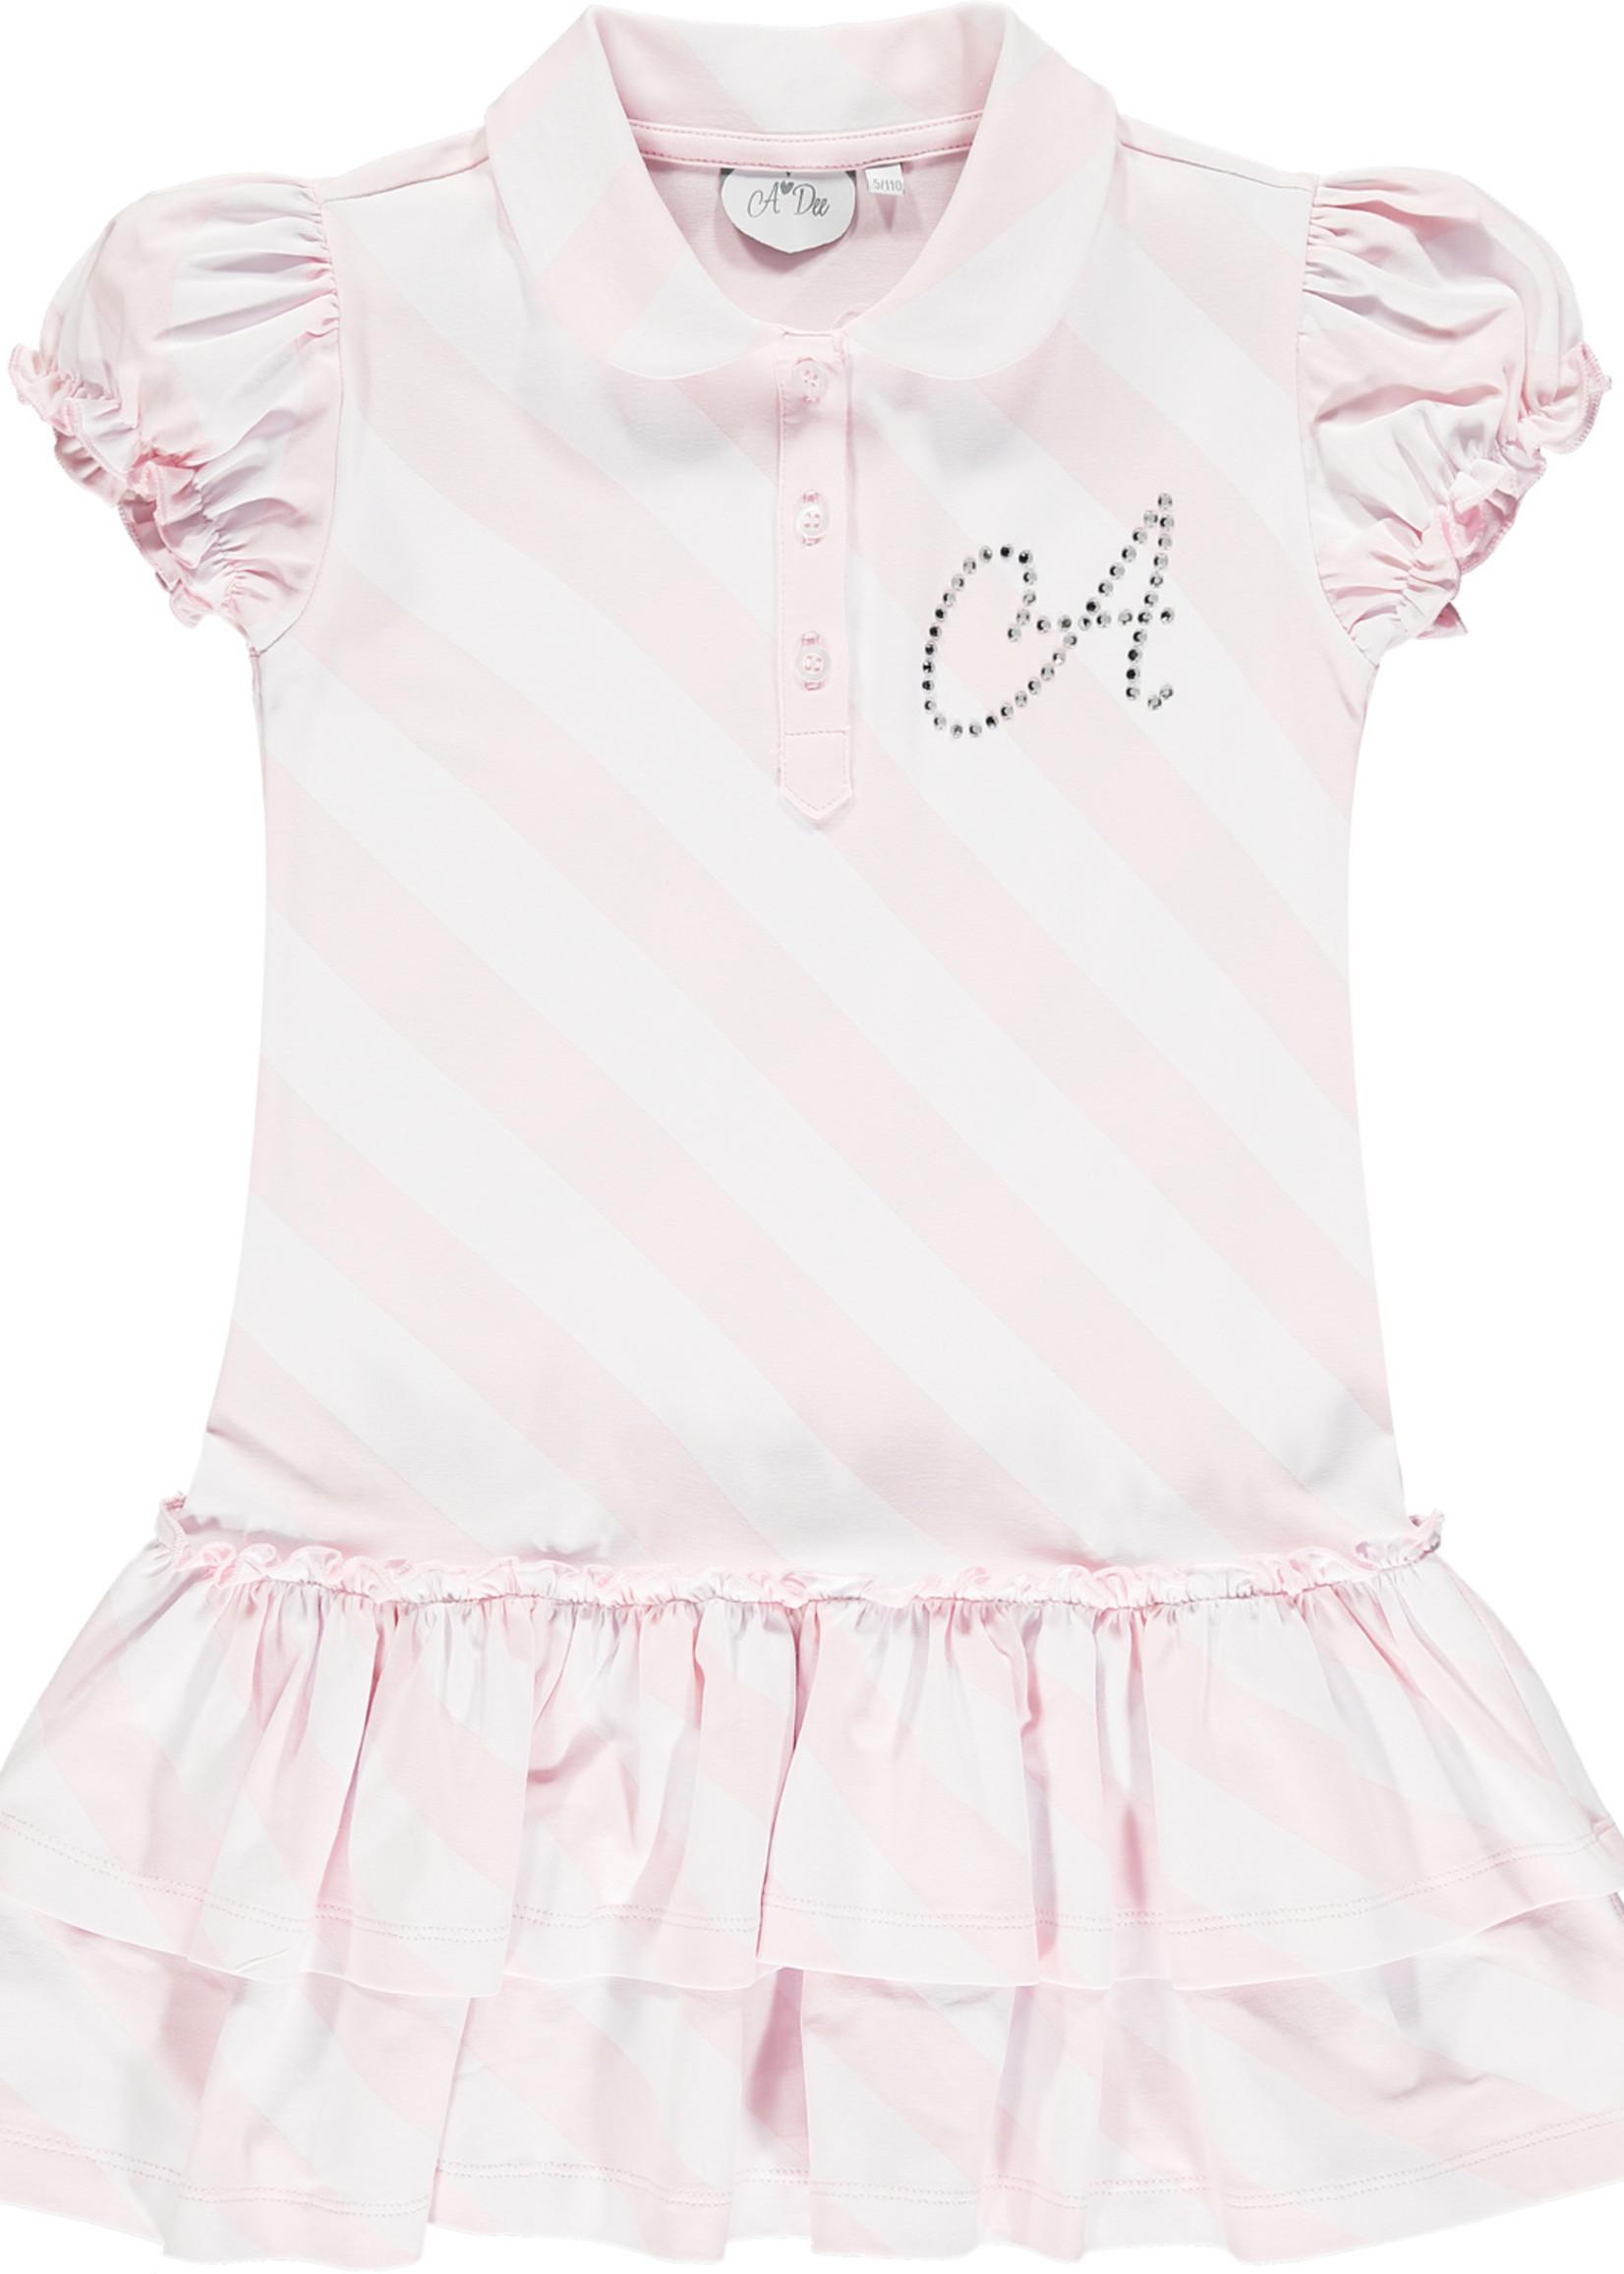 A Dee Orinthia jersey tennis dress